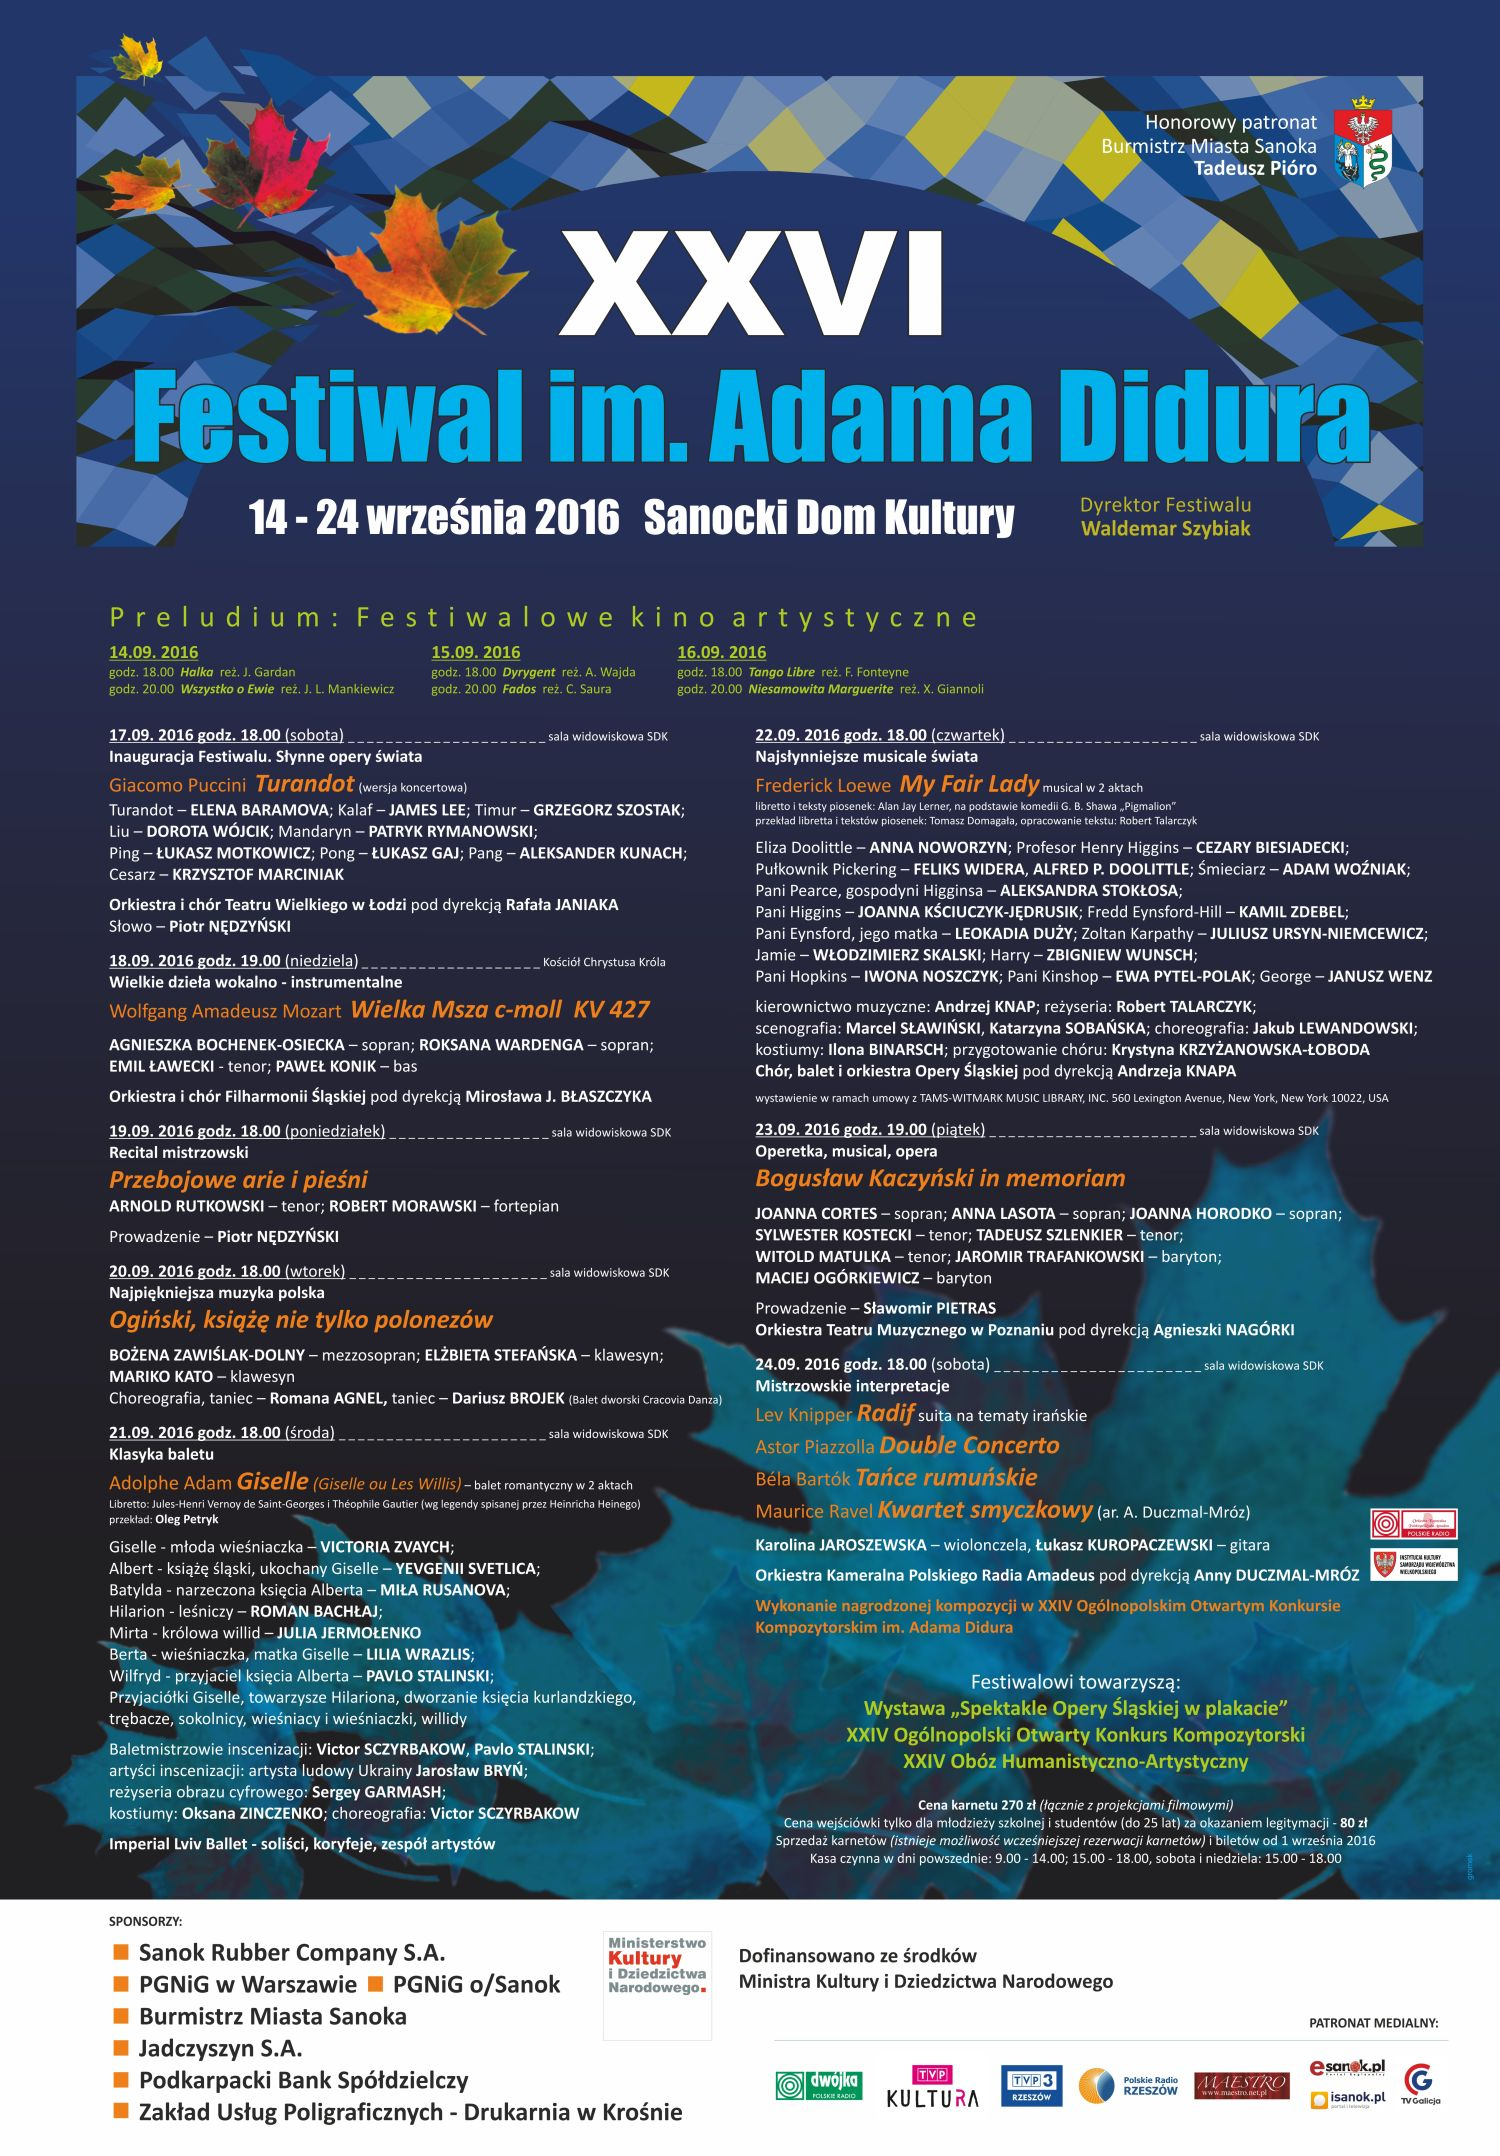 PLAKAT 26 Festiwal im. Adama Didura